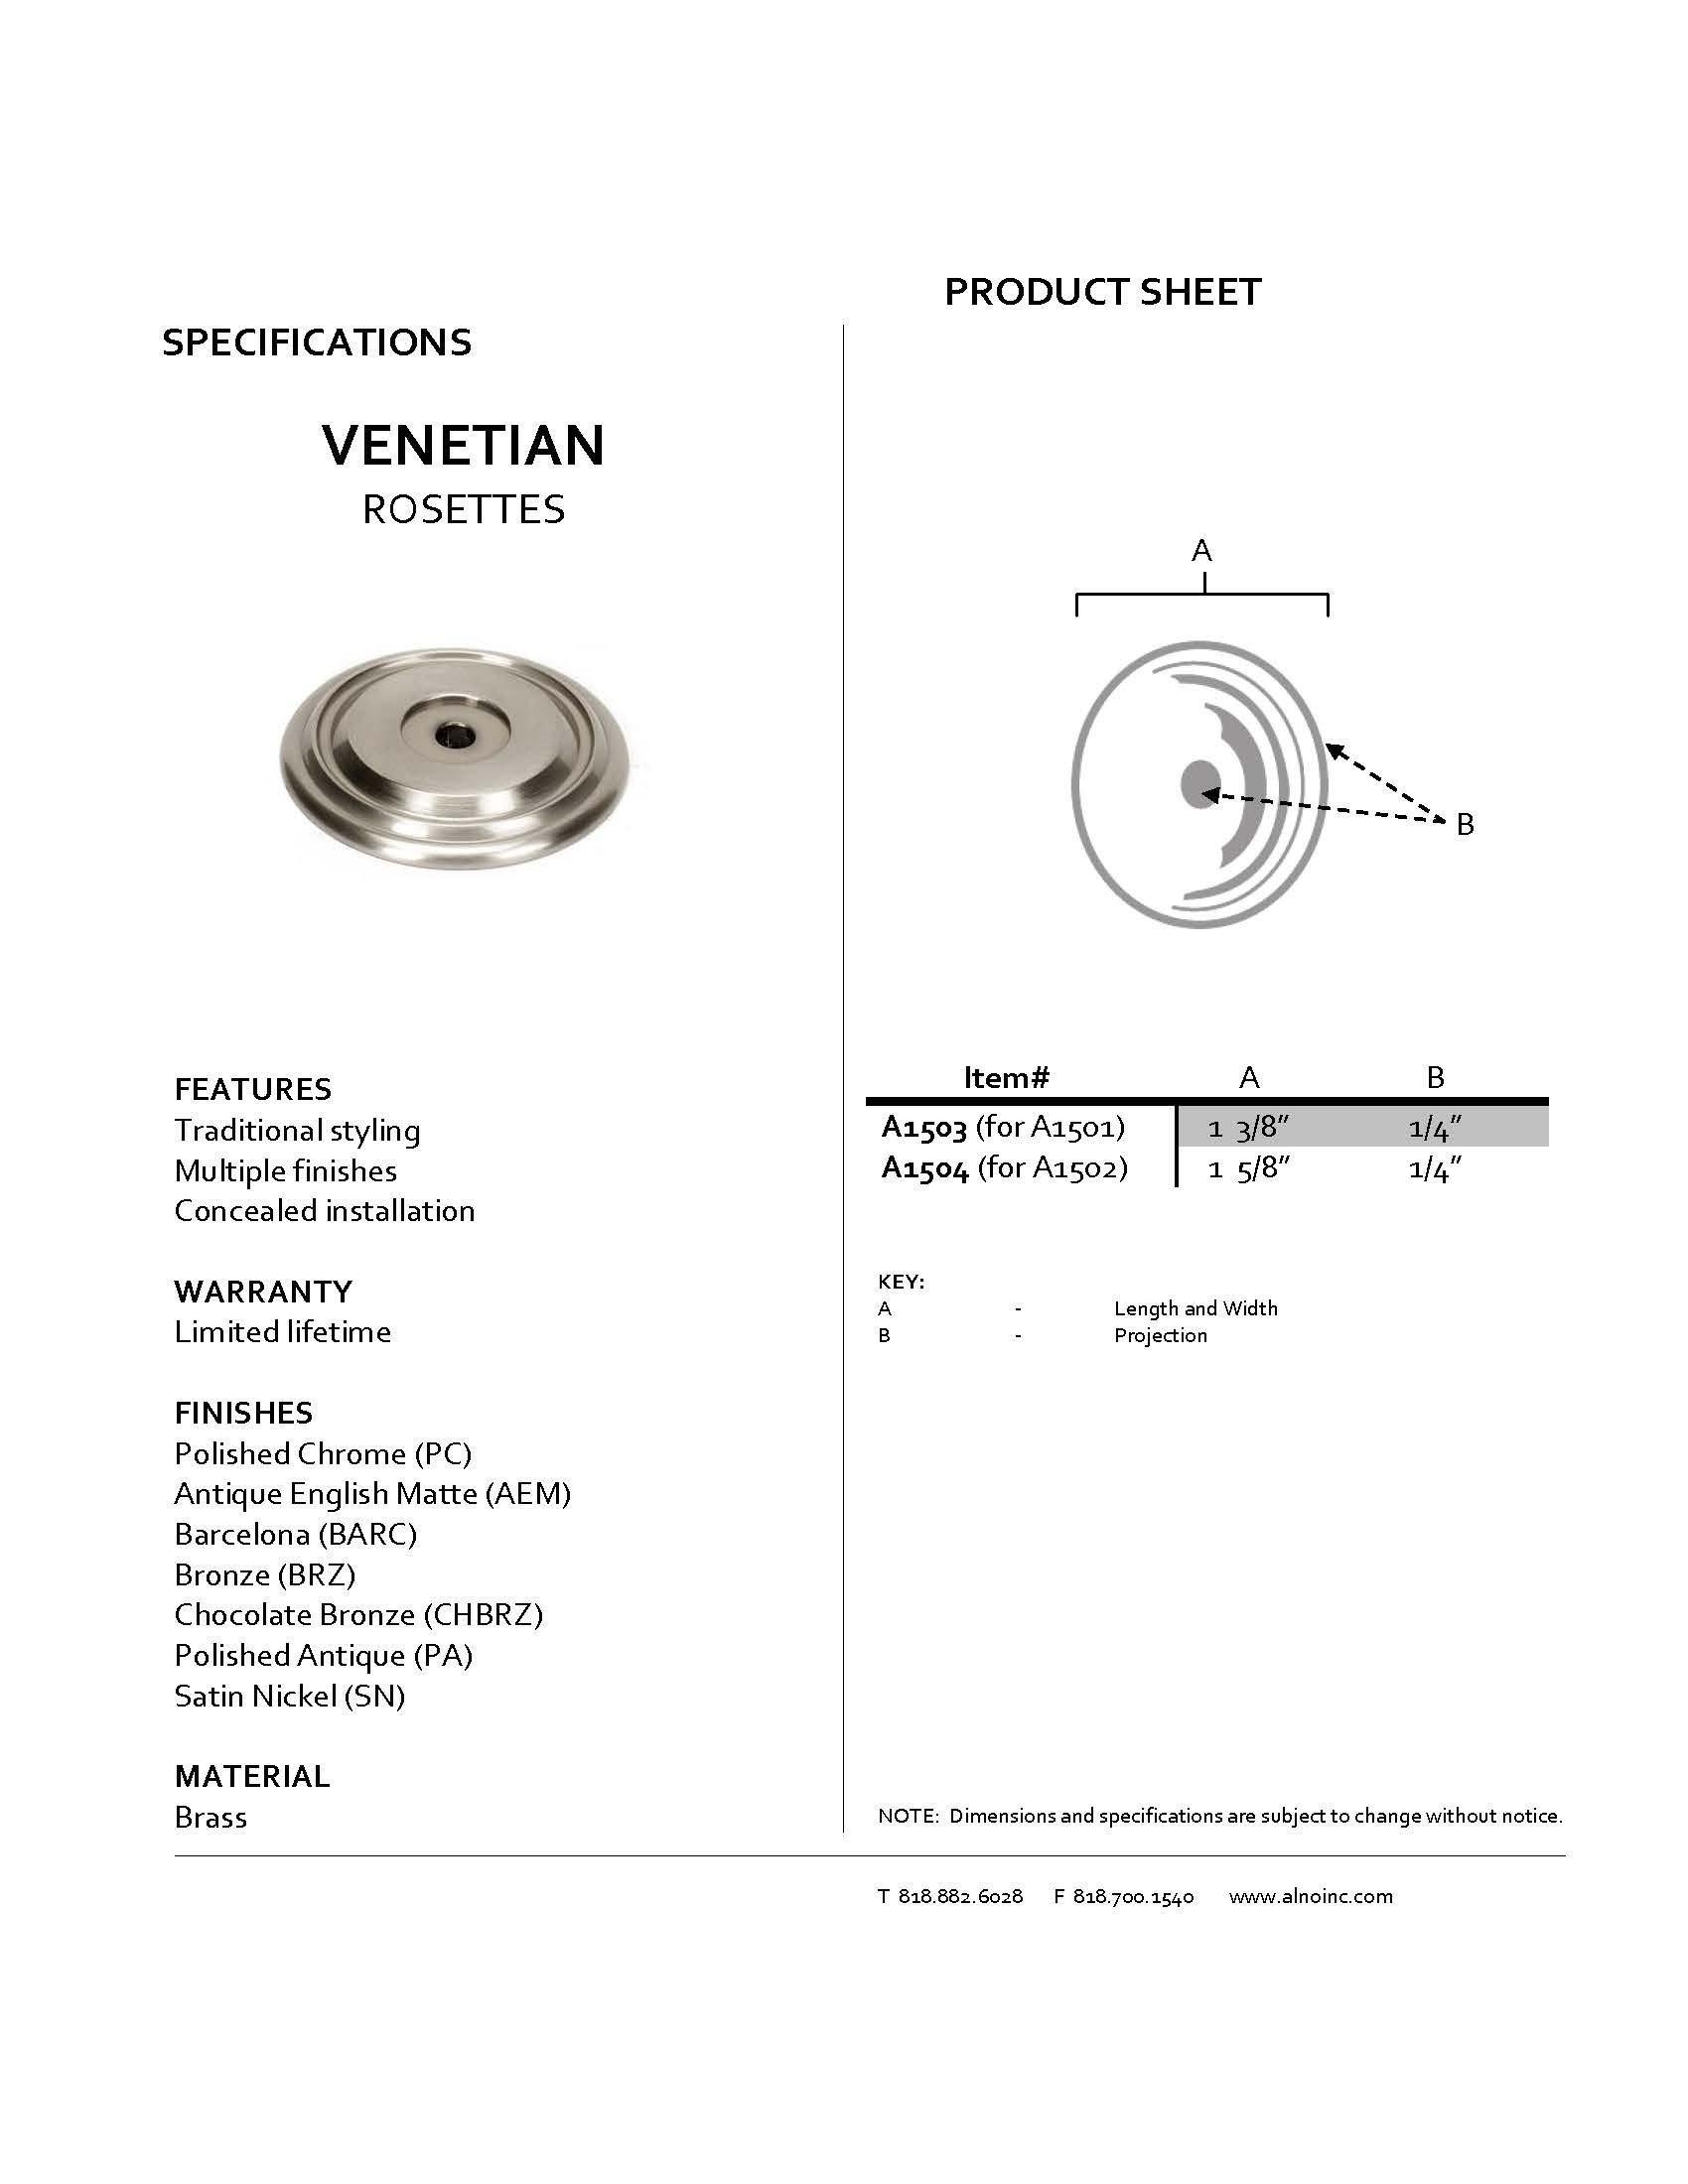 Alno A1504-BARC Traditional Venetian Rosettes, Barcelona, 1-5/8''